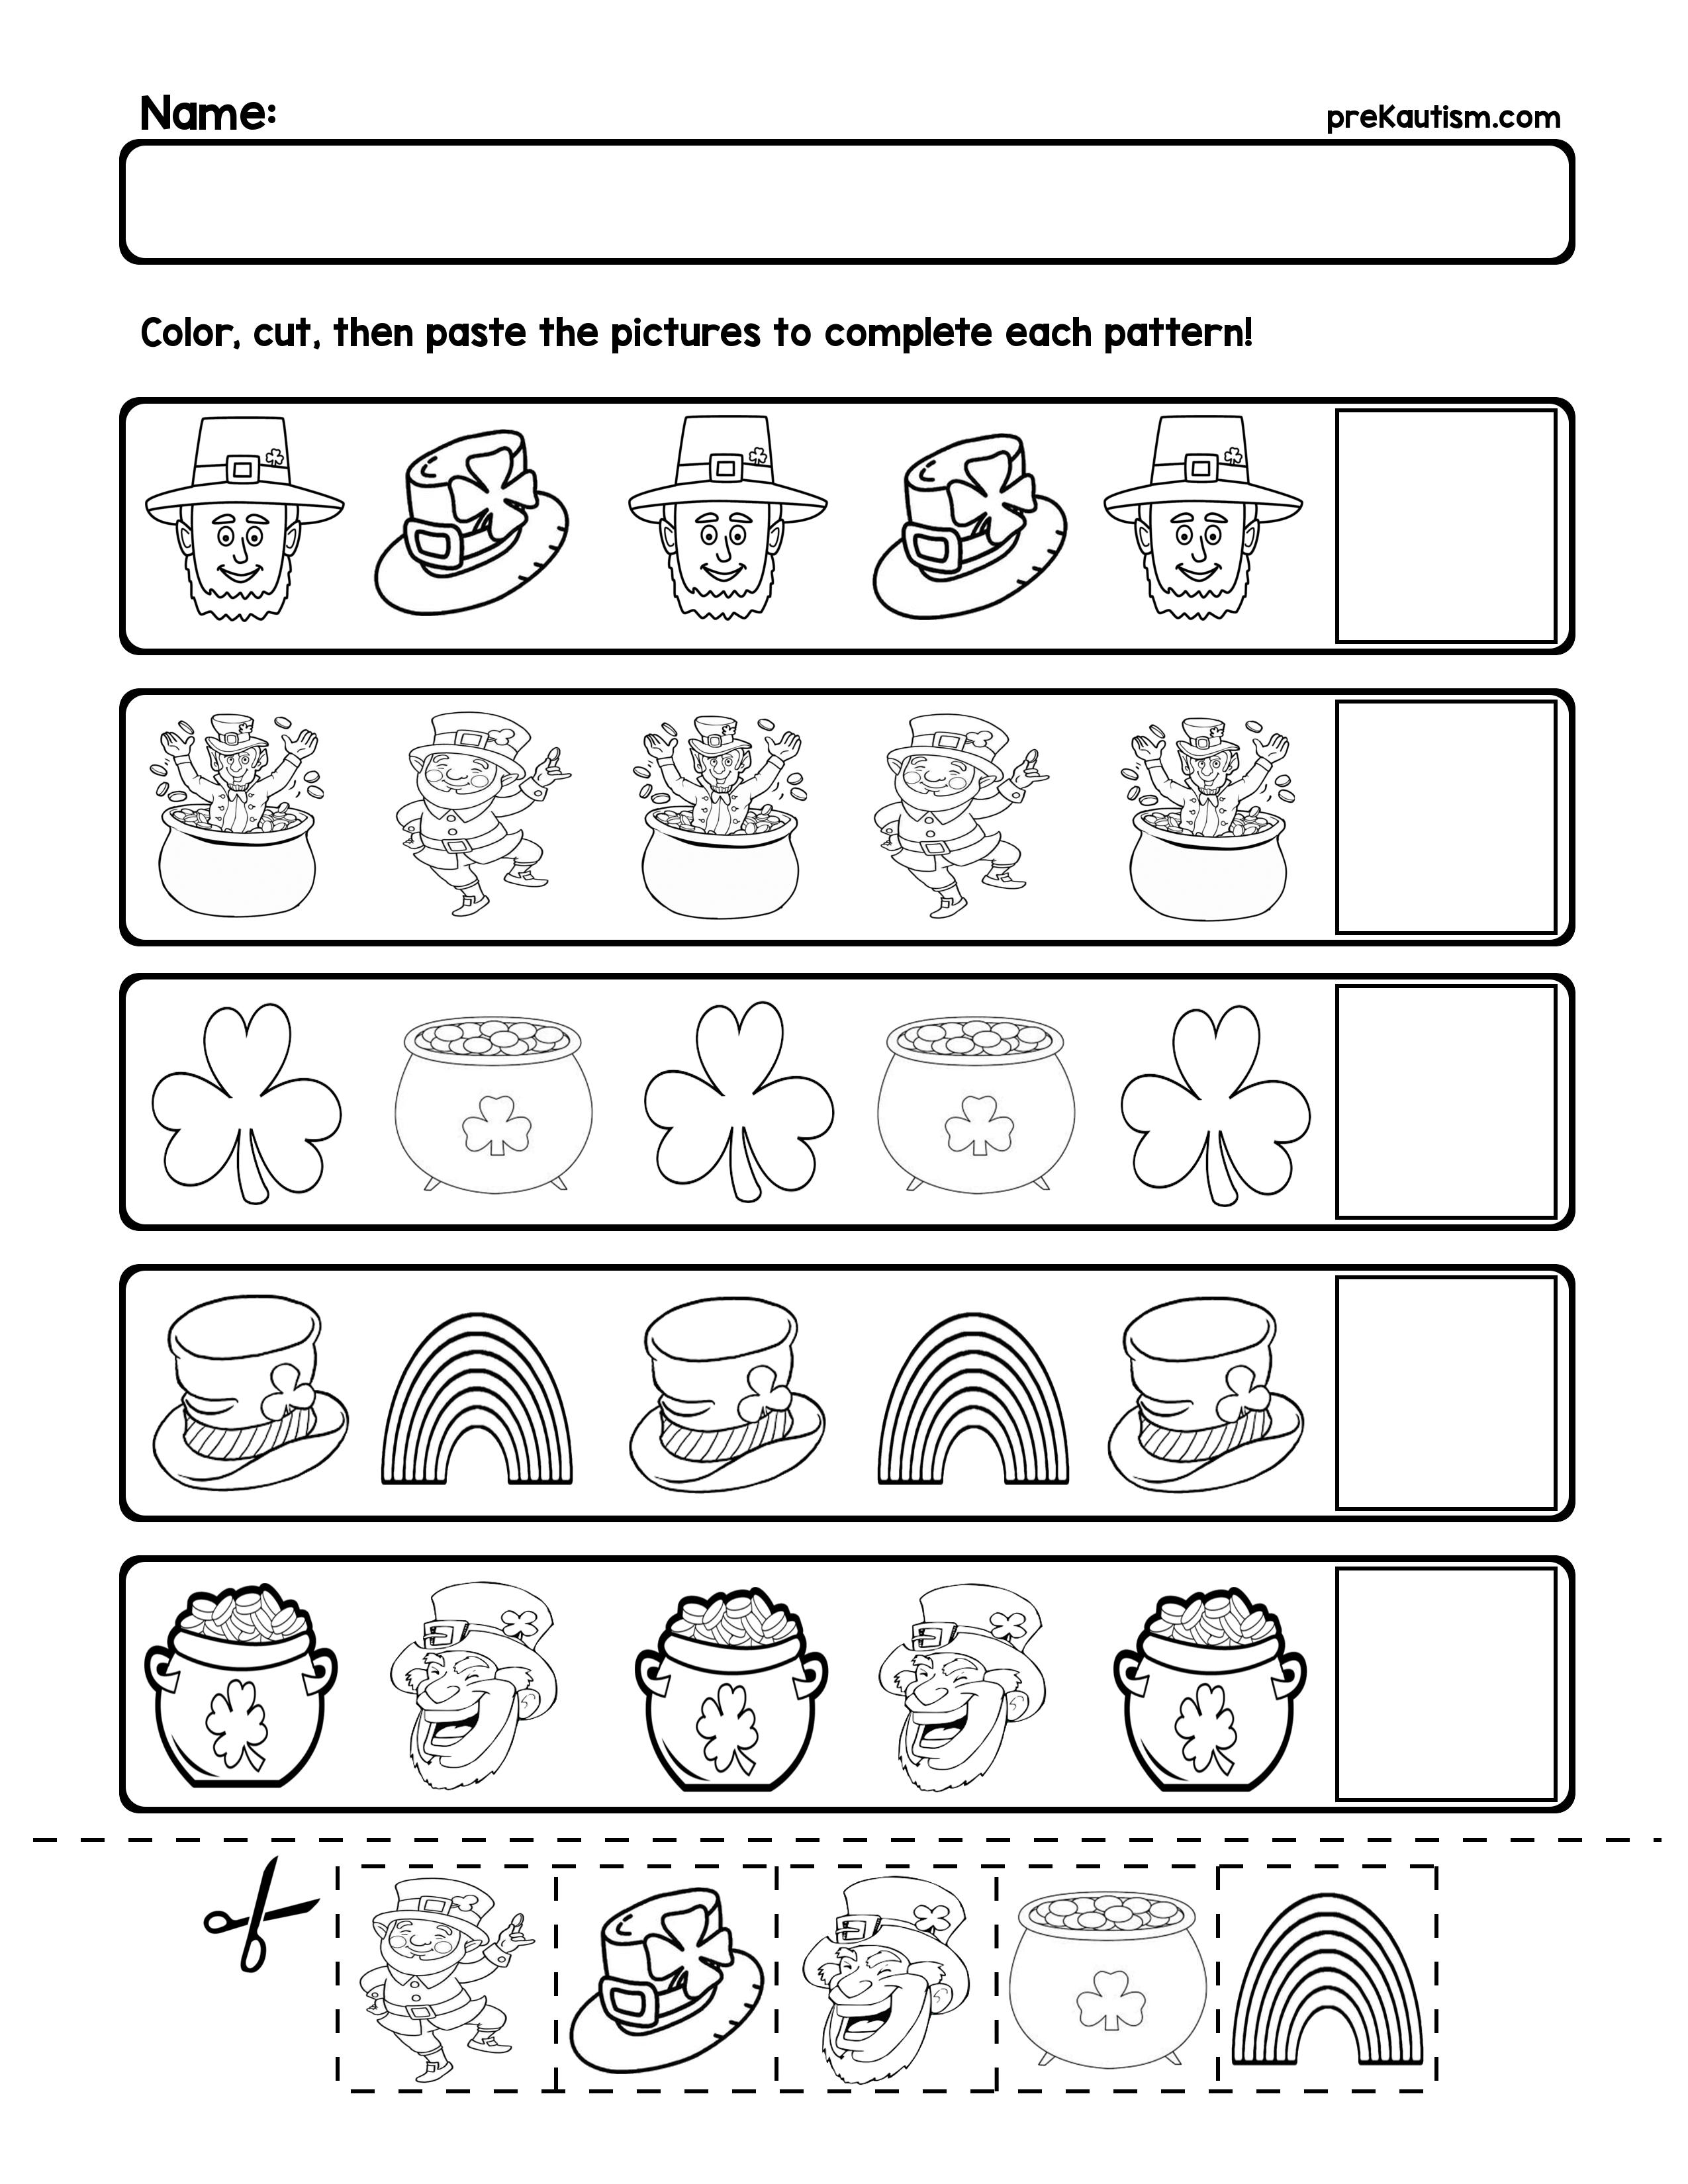 St Patricks Day Pattern Worksheets Google Search Pattern Worksheet Ab Patterns Ab Pattern Worksheet [ 3300 x 2550 Pixel ]